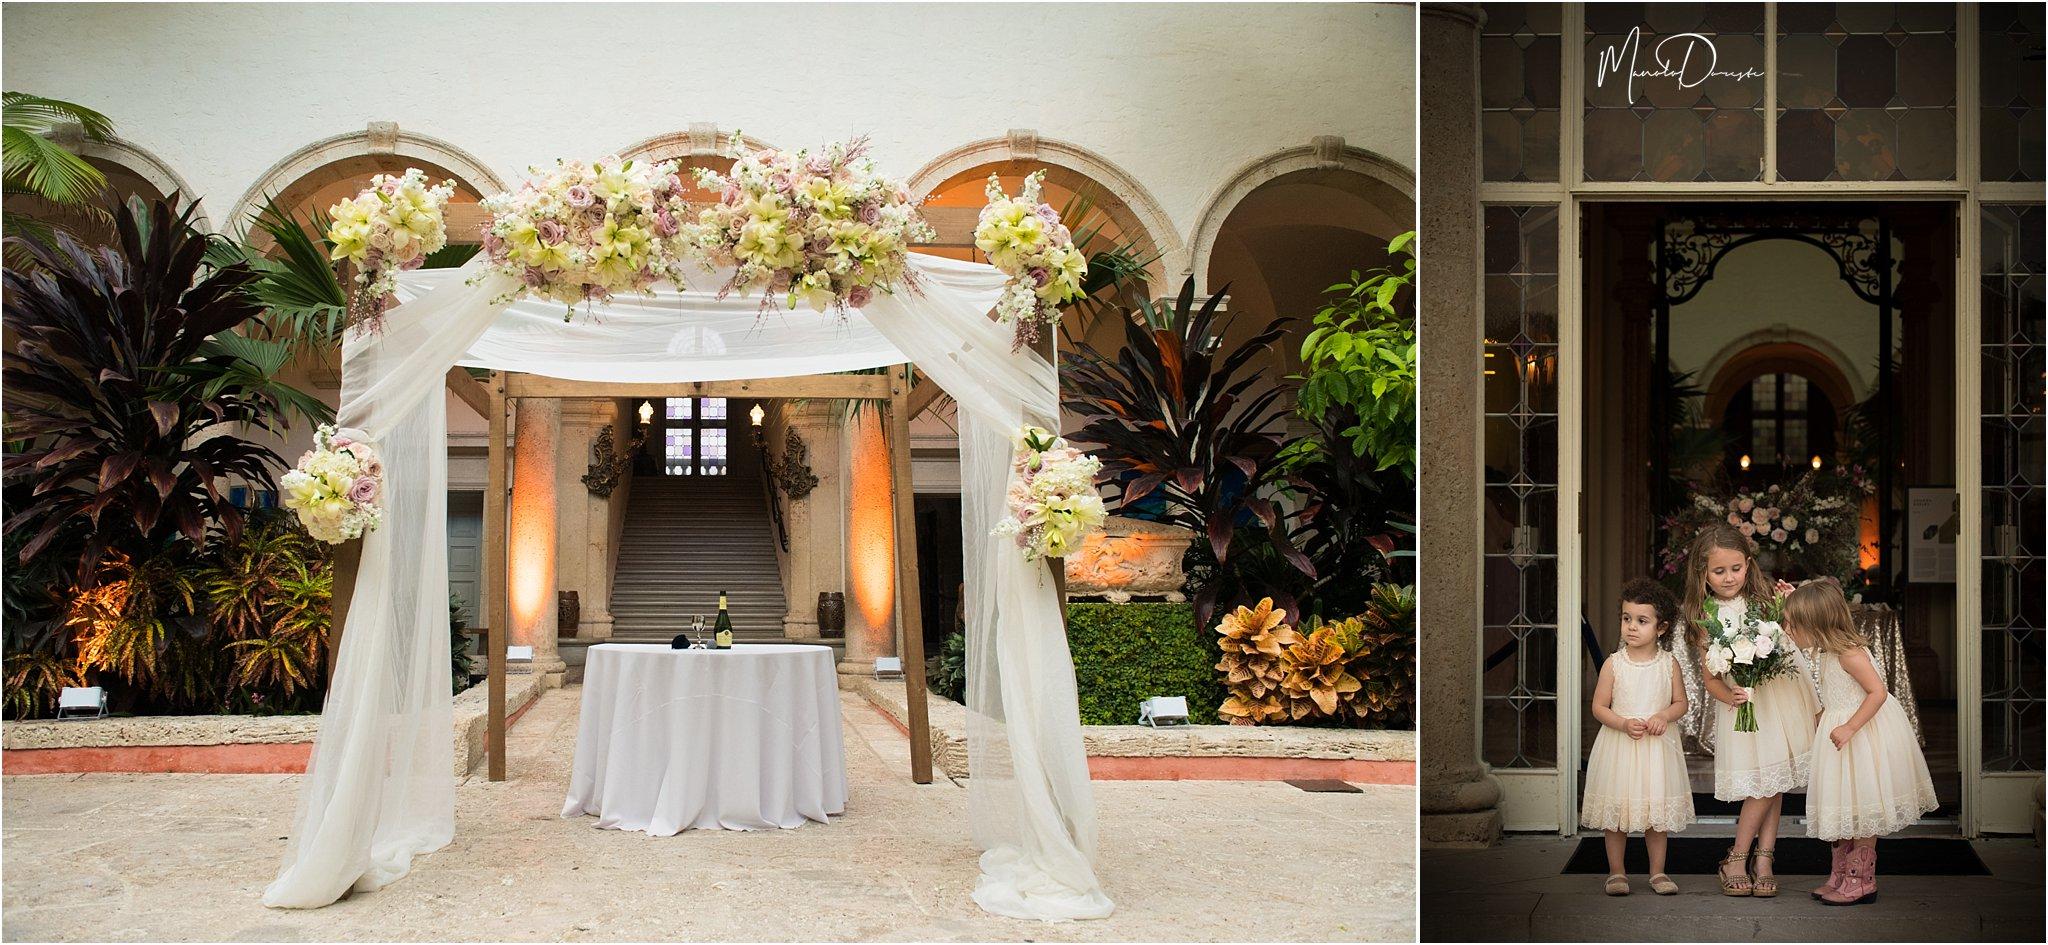 00756_ManoloDoreste_InFocusStudios_Wedding_Family_Photography_Miami_MiamiPhotographer.jpg